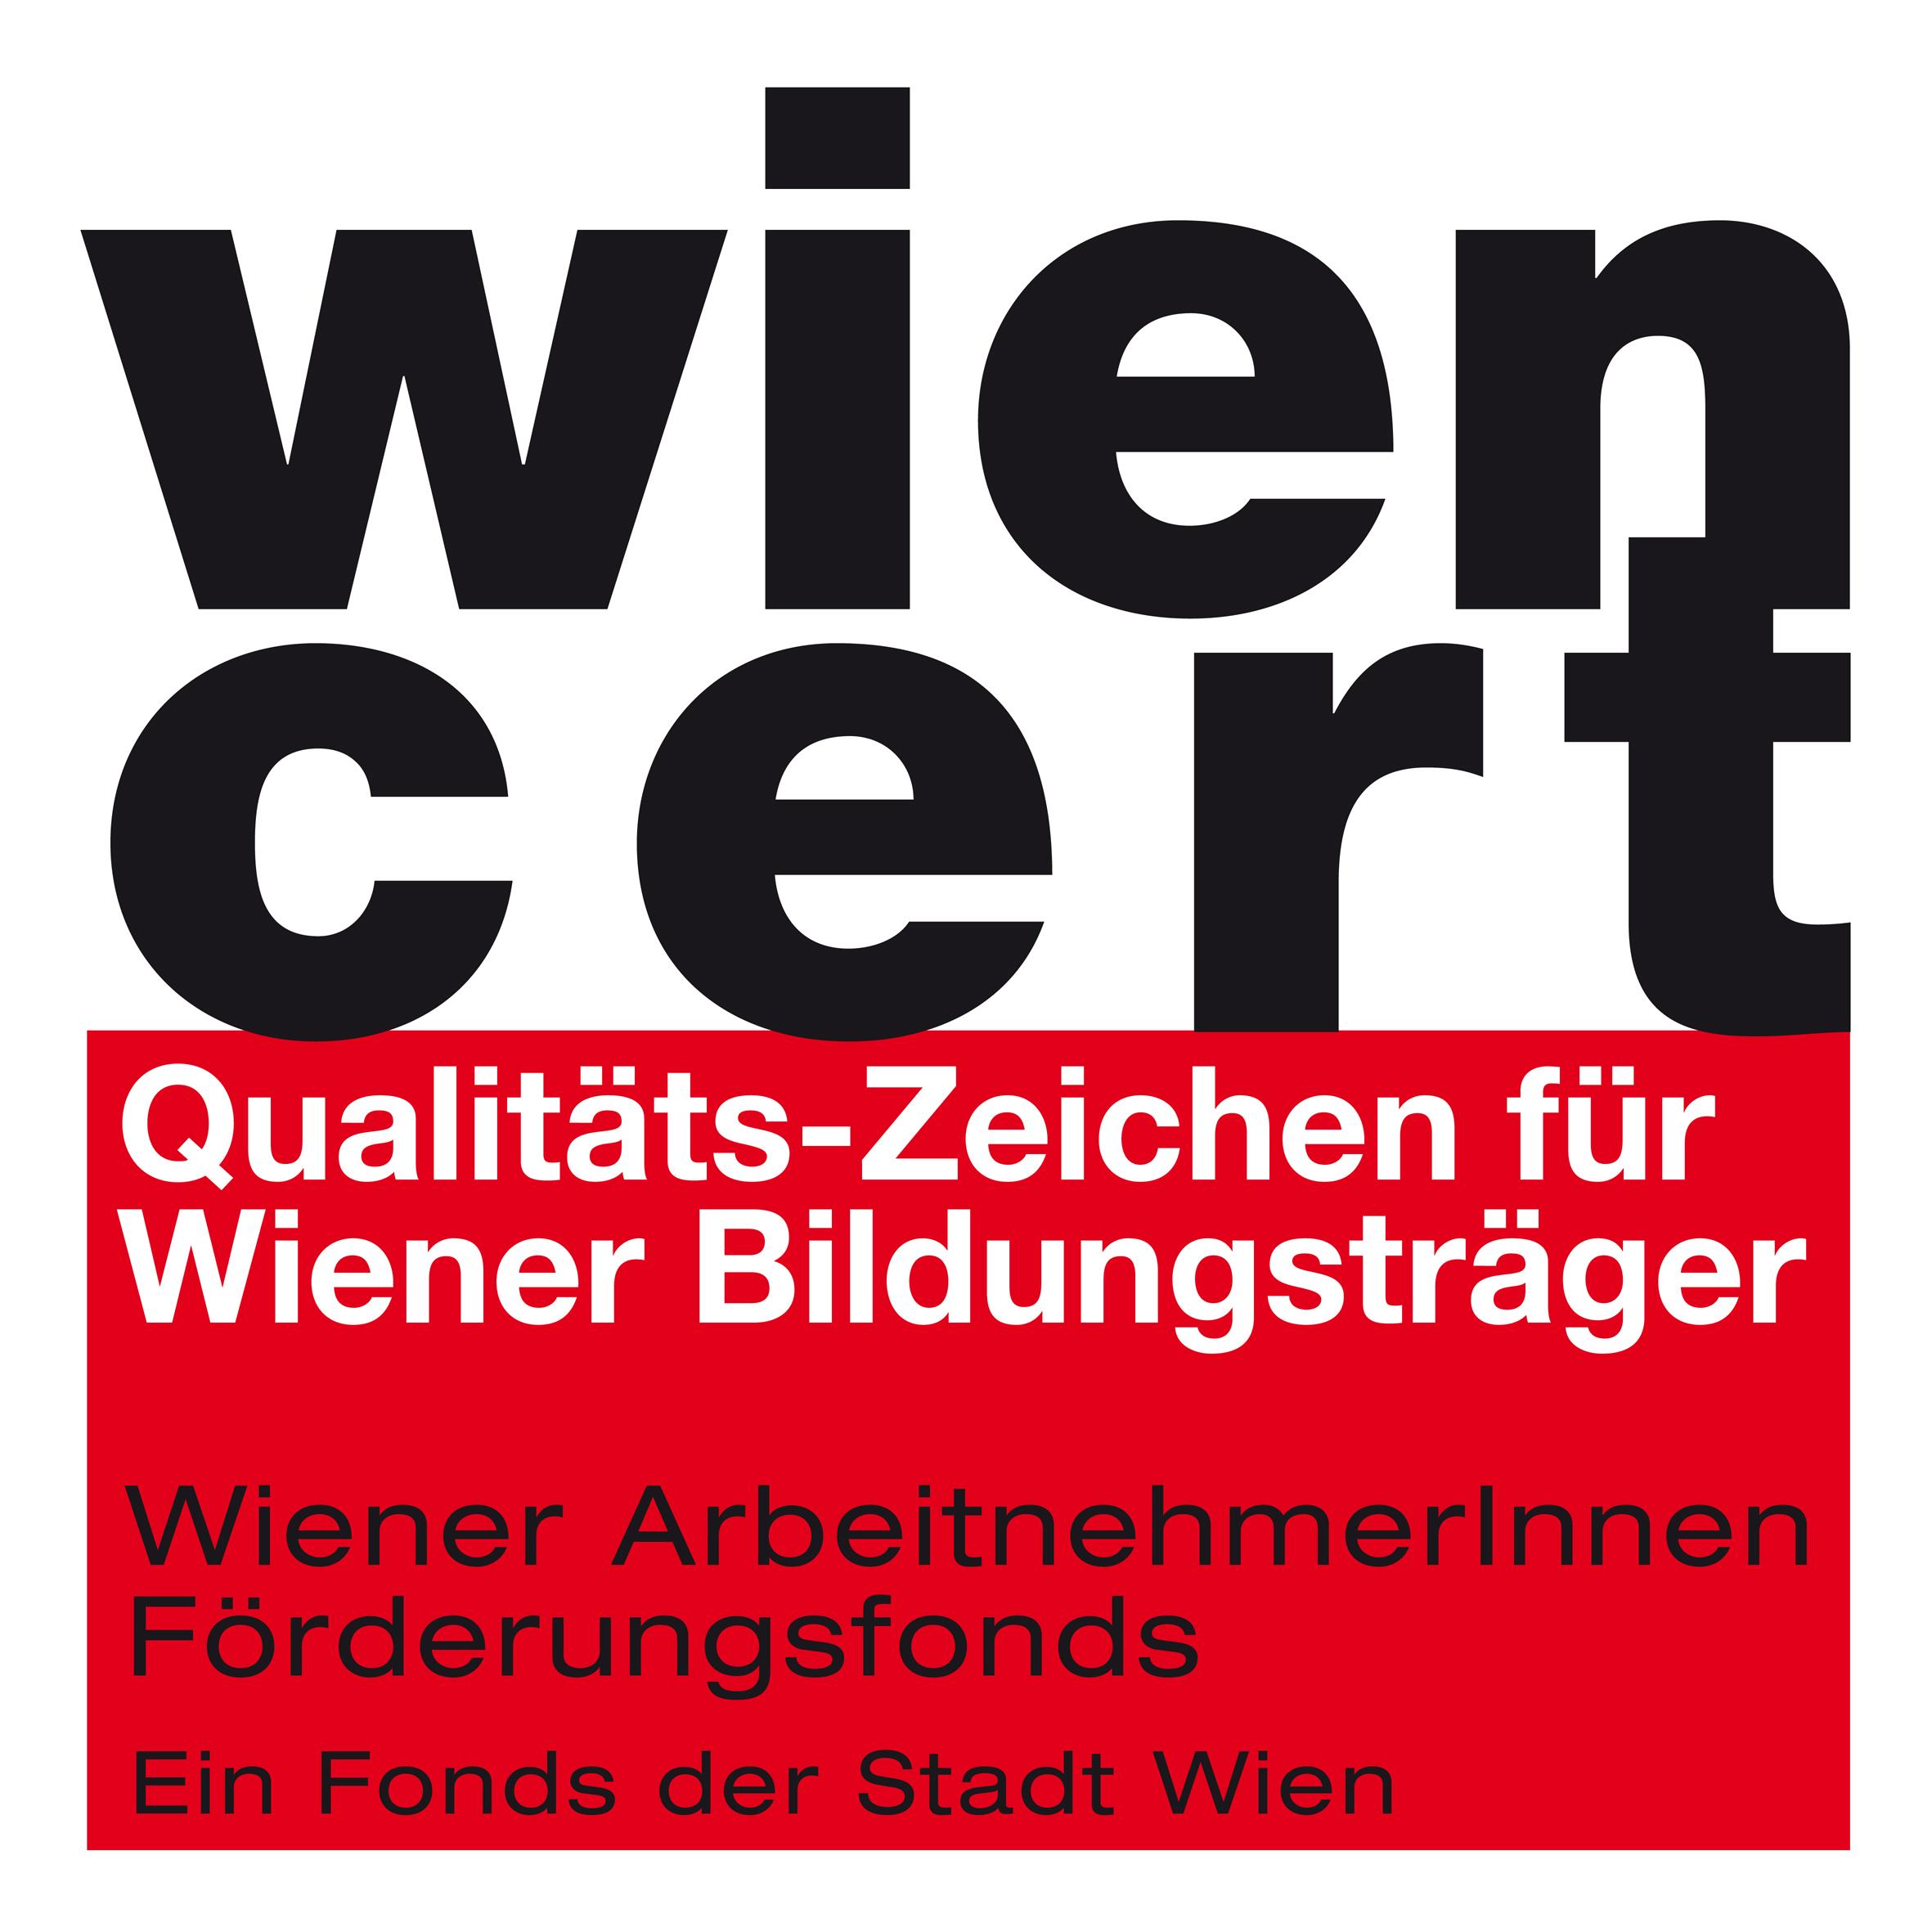 Wien-Cert_10x10_RGB_RZ.jpg